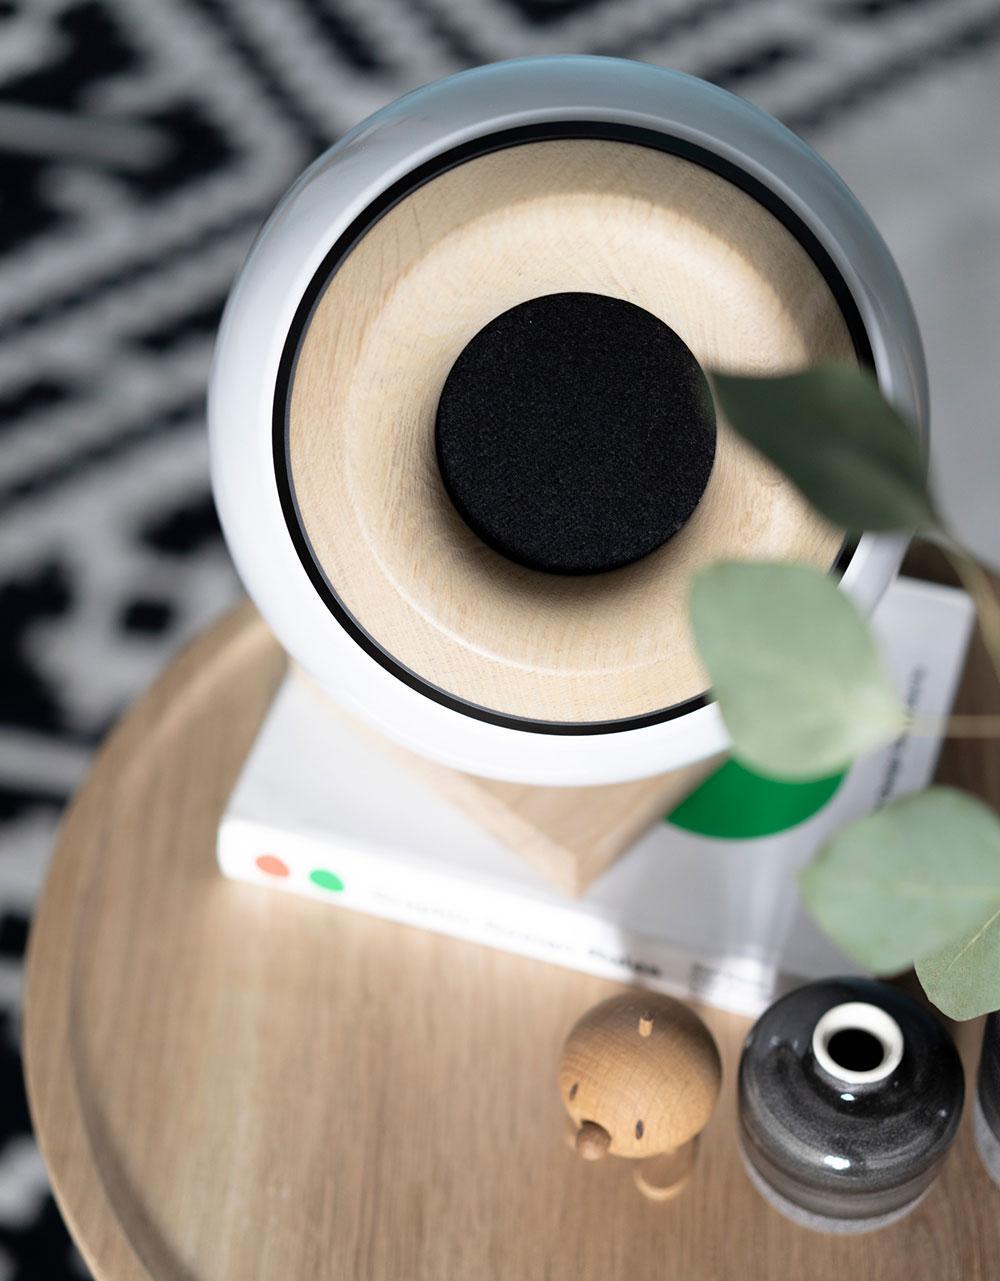 Oupio Speaker and Light Combo